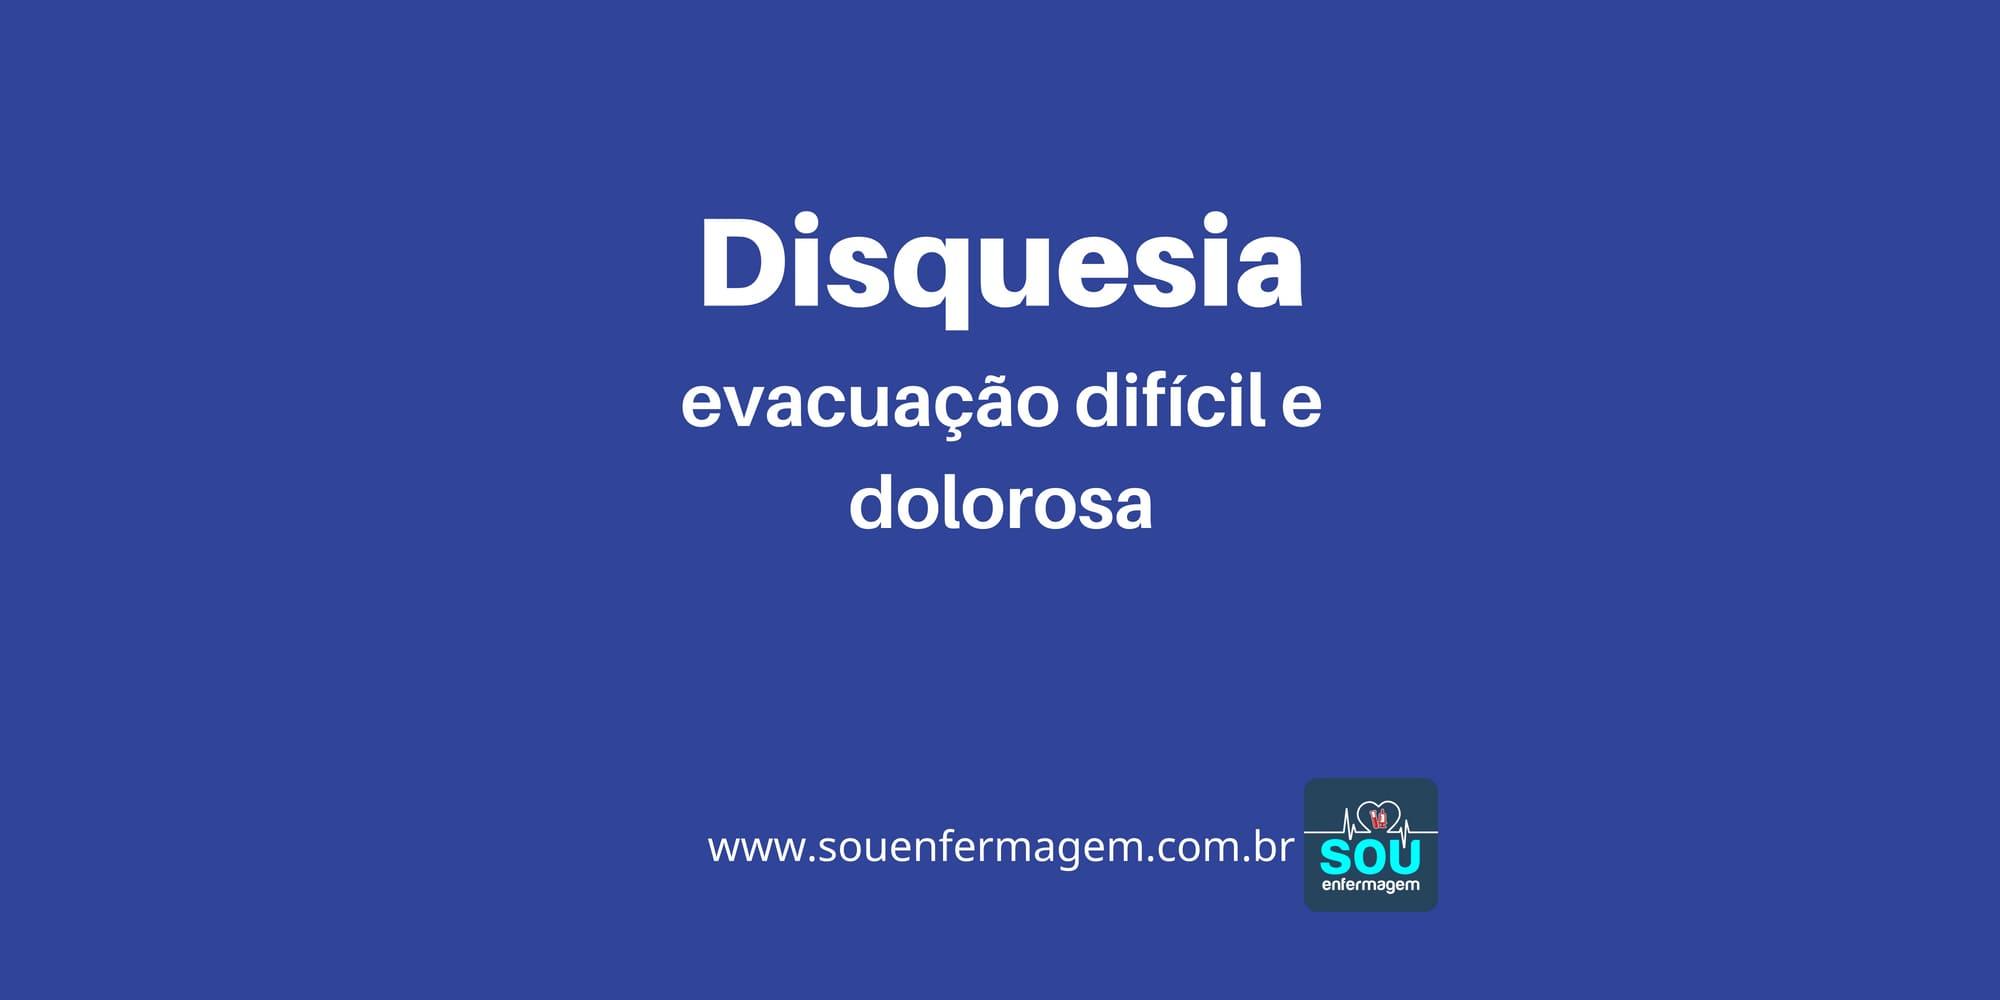 Disquesia